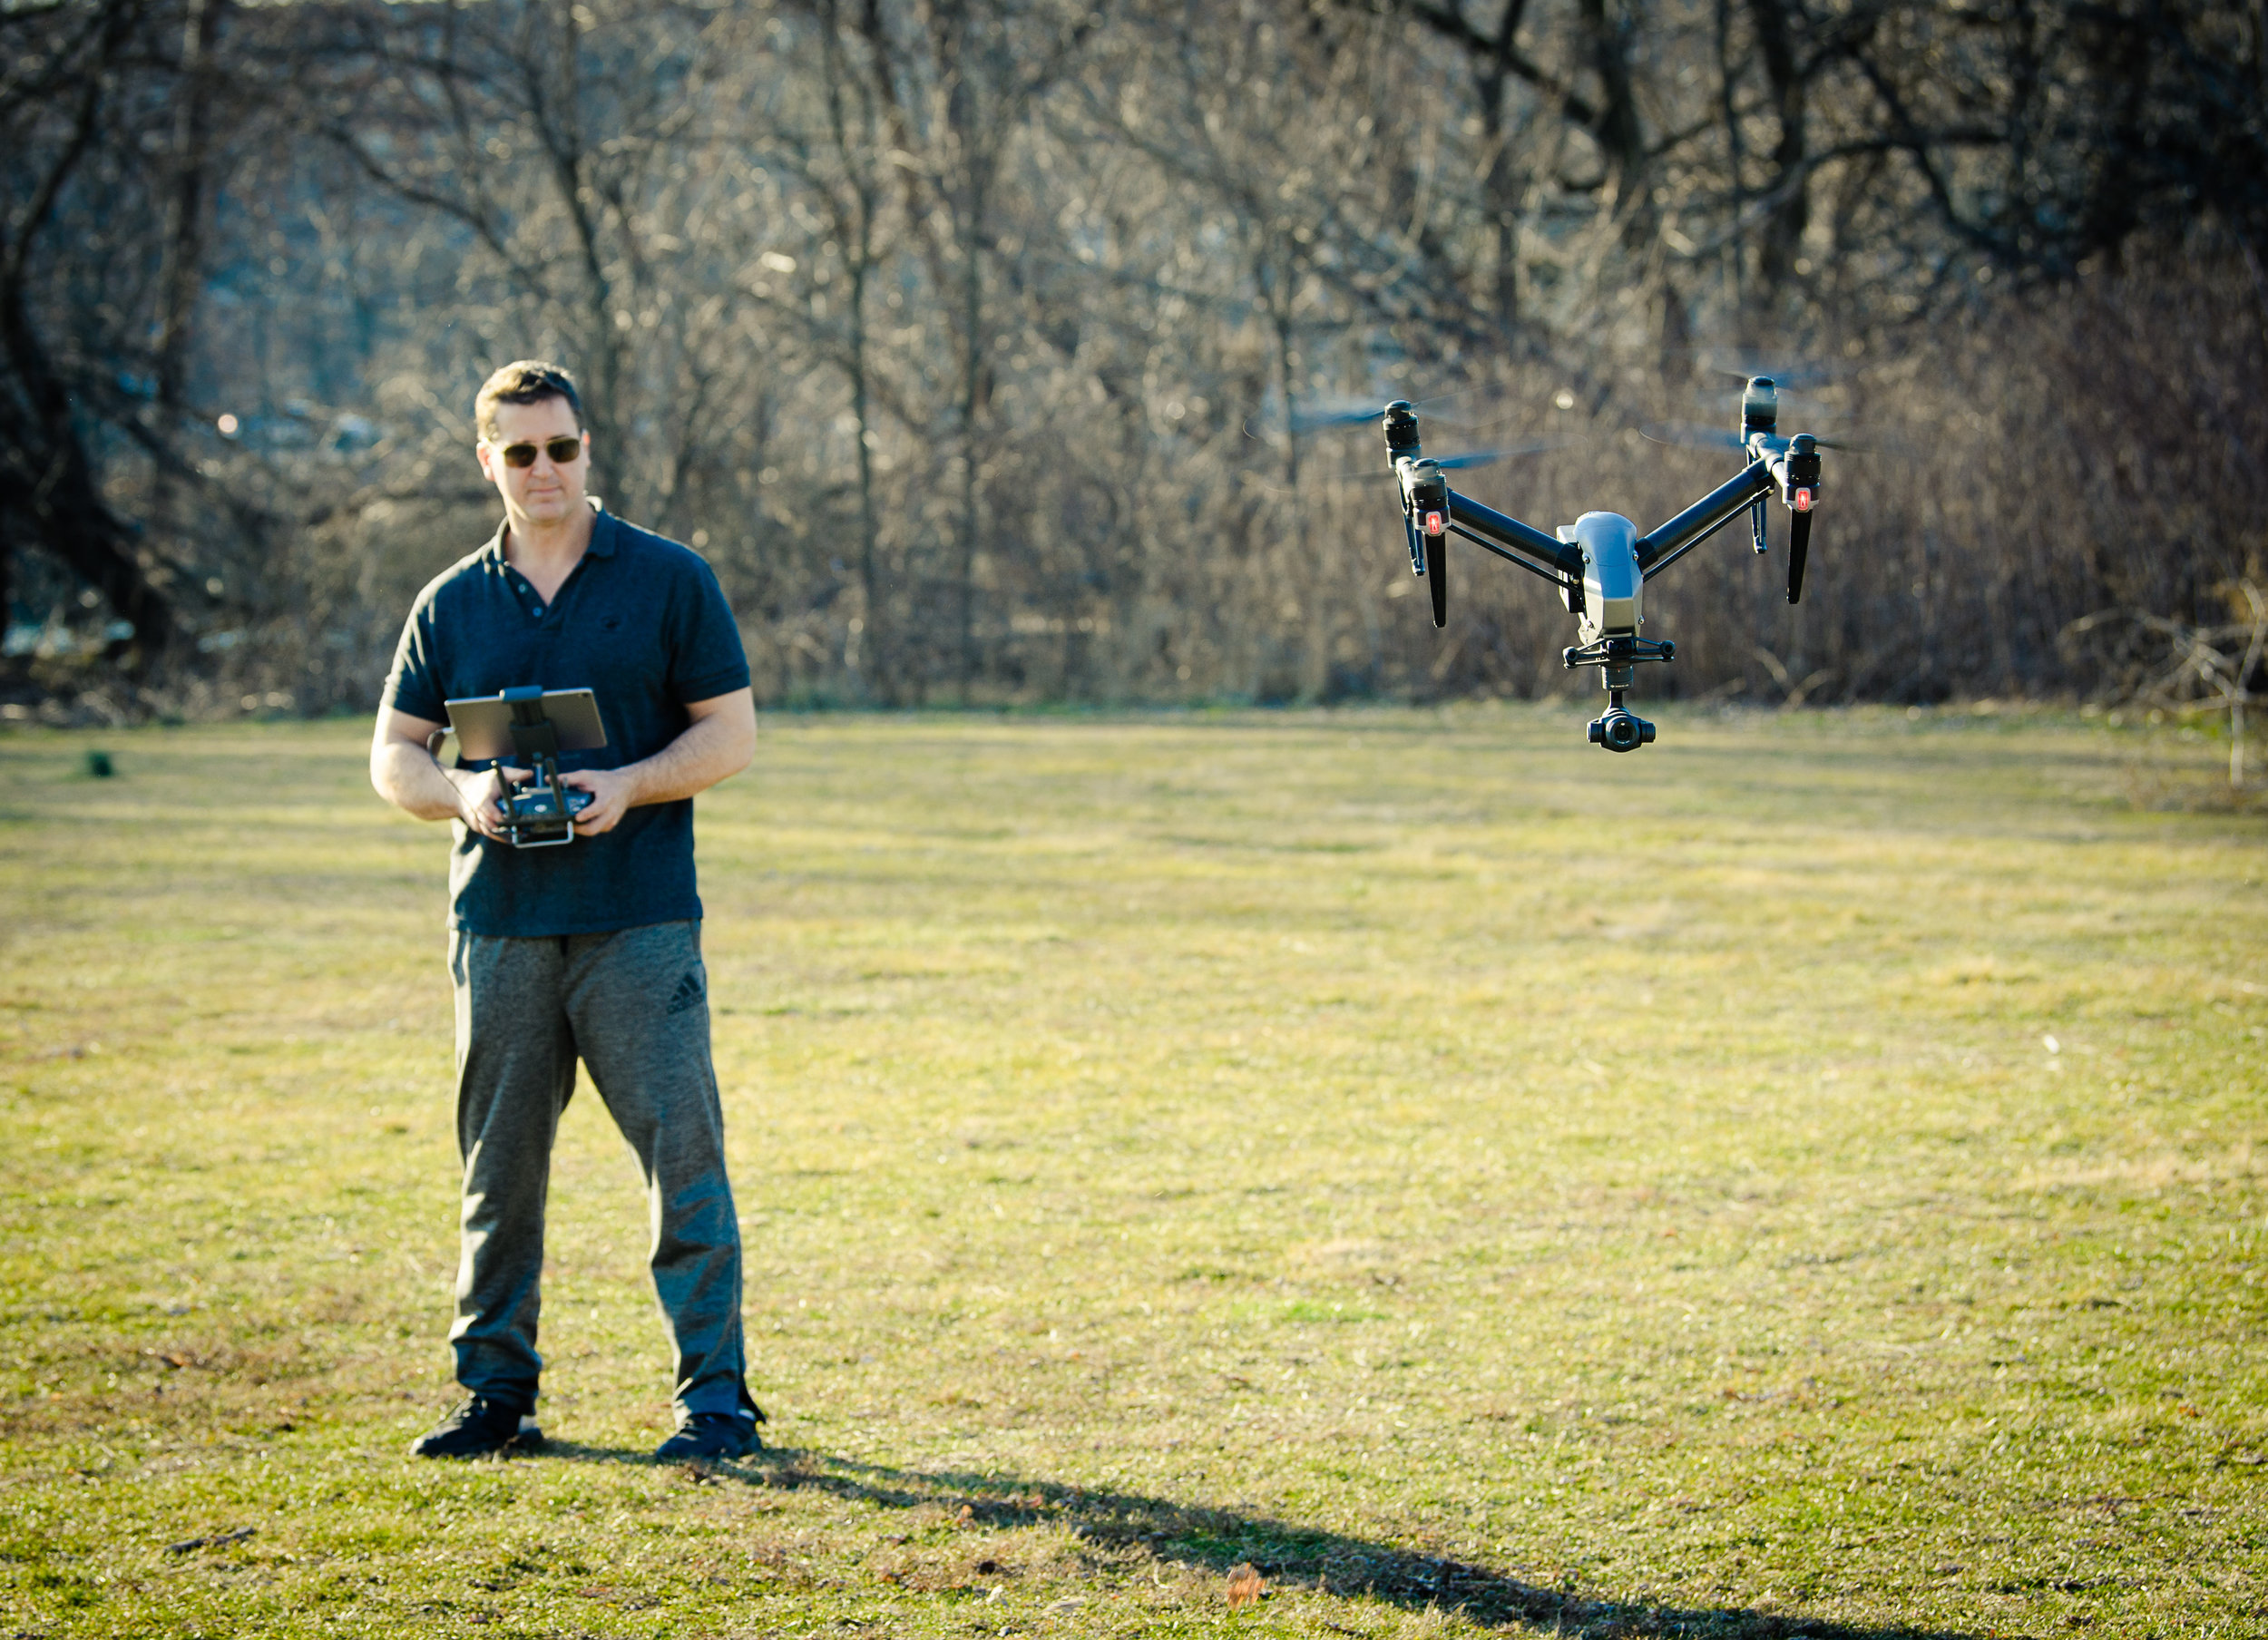 FAA Certified UAS Pilot Dave Kotinsky flying the DJI Inspire 2